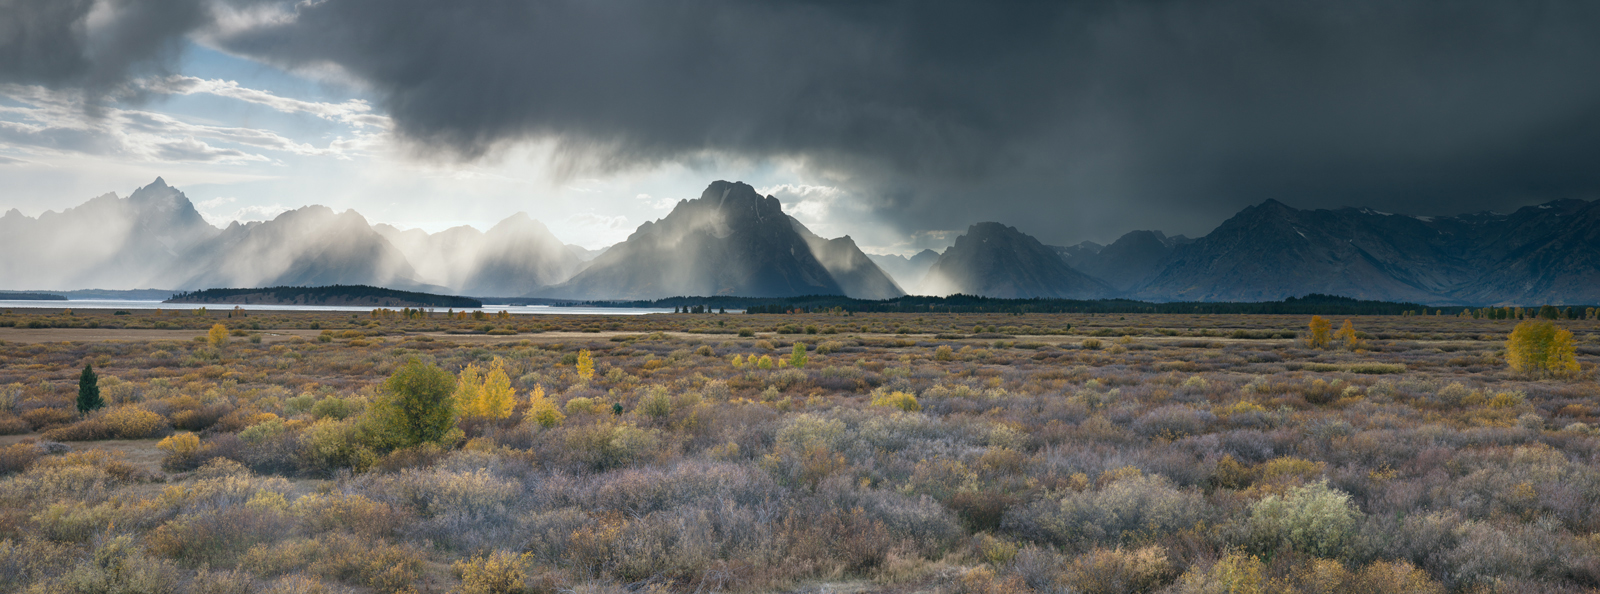 Panoramic, landscape, Grand Teton, Autumn, fall colors, storm, light, clouds, panoramique, paysage, orage, automne, photo